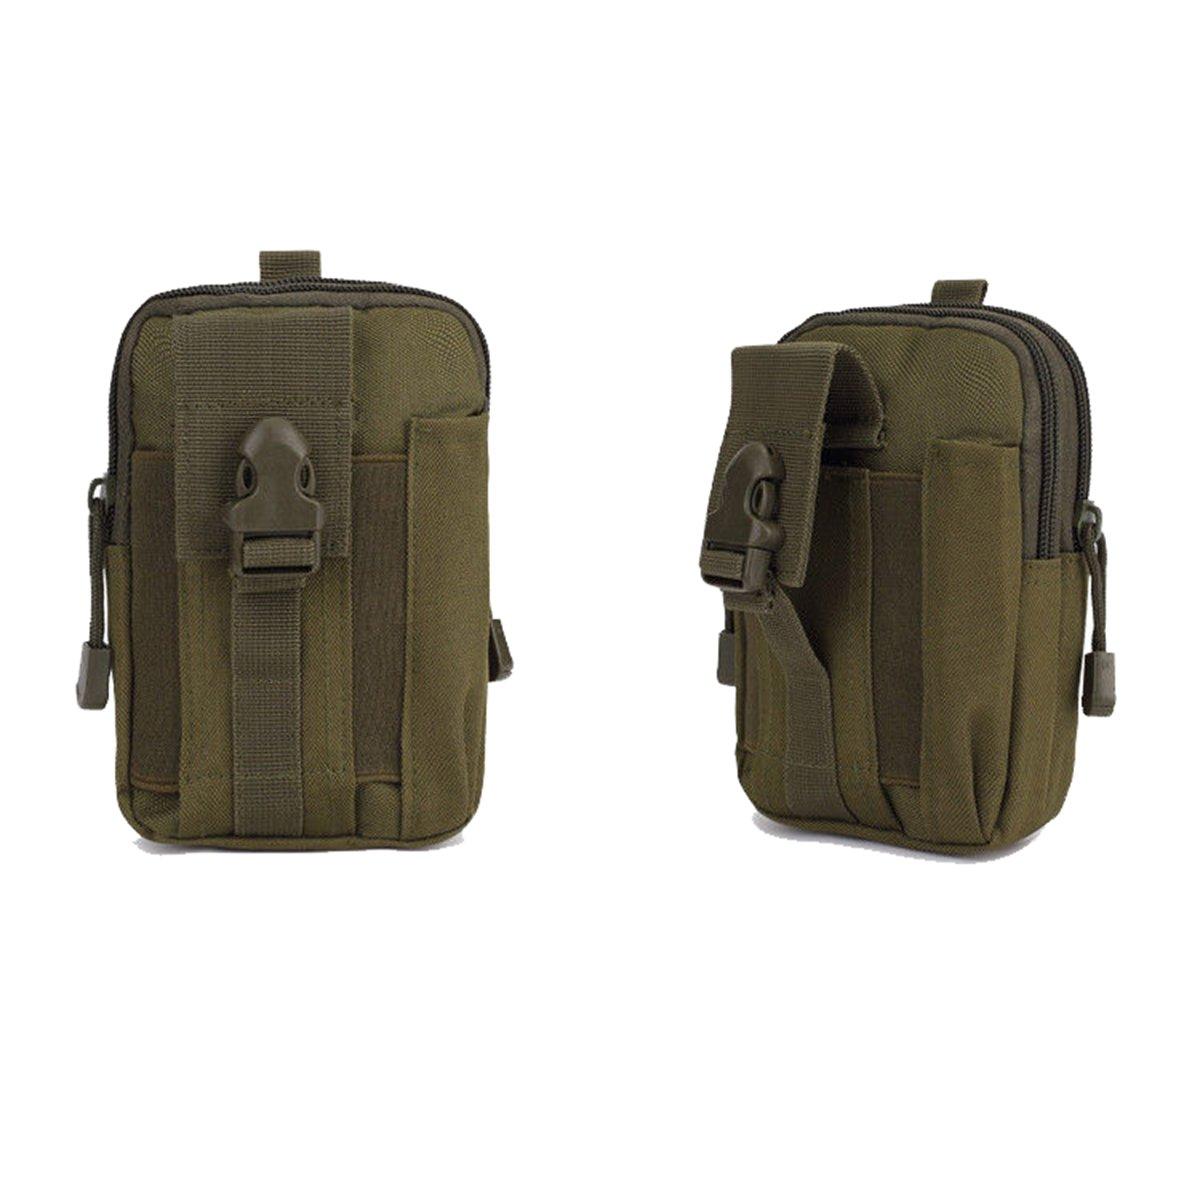 Generic Tactical Molle Pouch Belt Waist Pack Bag Military Waist Pocket Waterproof